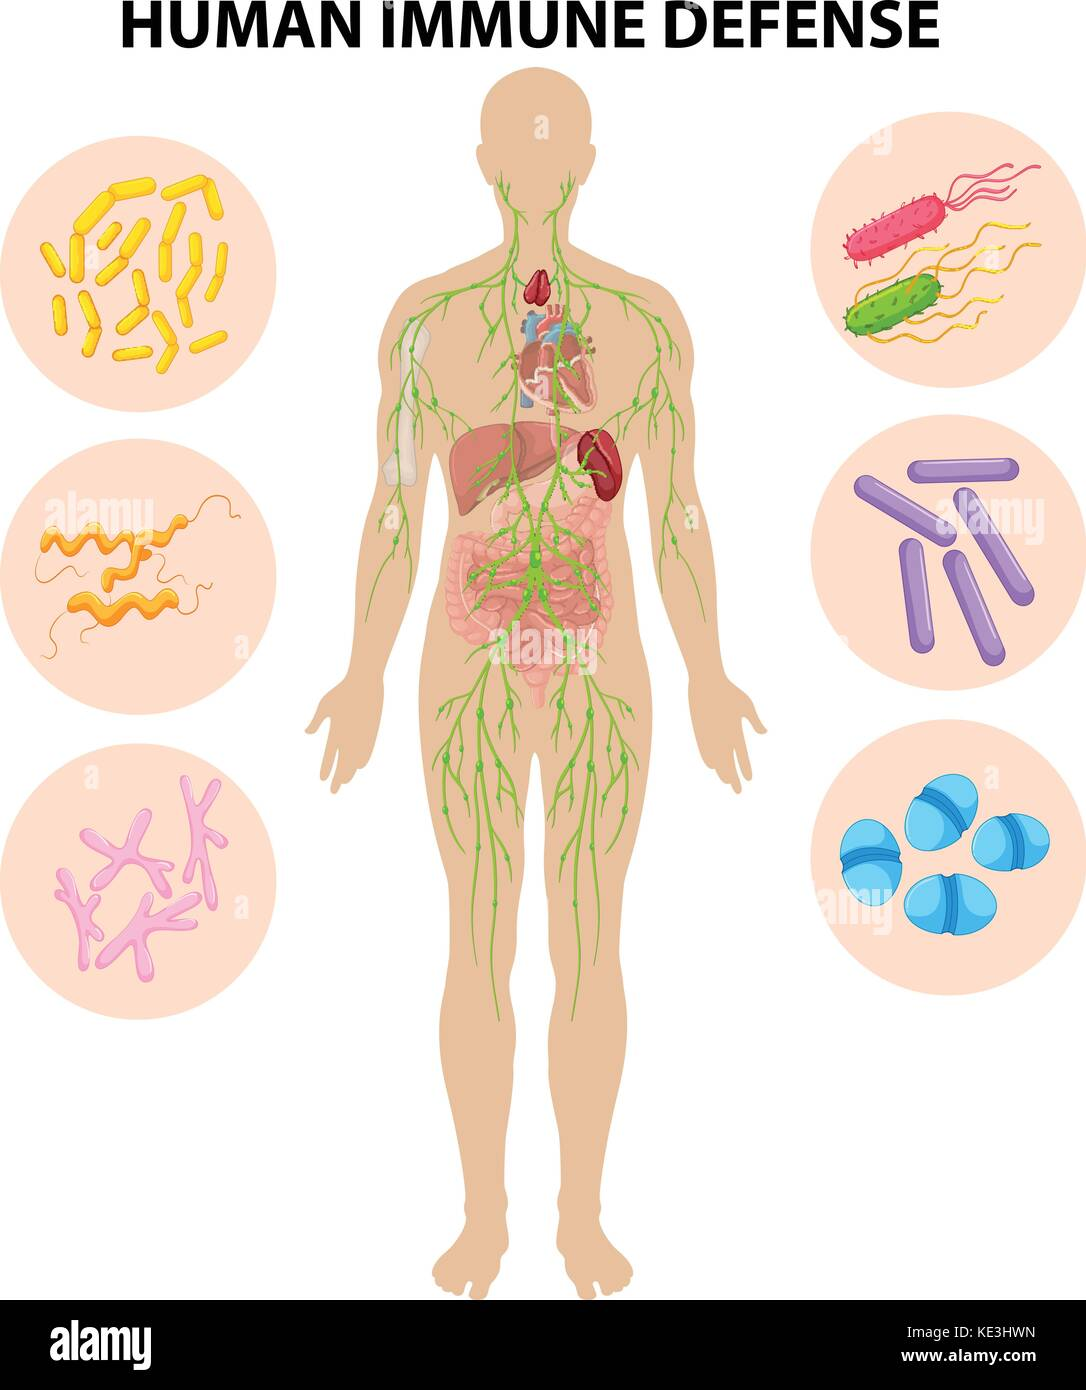 Human Body Immune System Illustration Stock Photos Amp Human